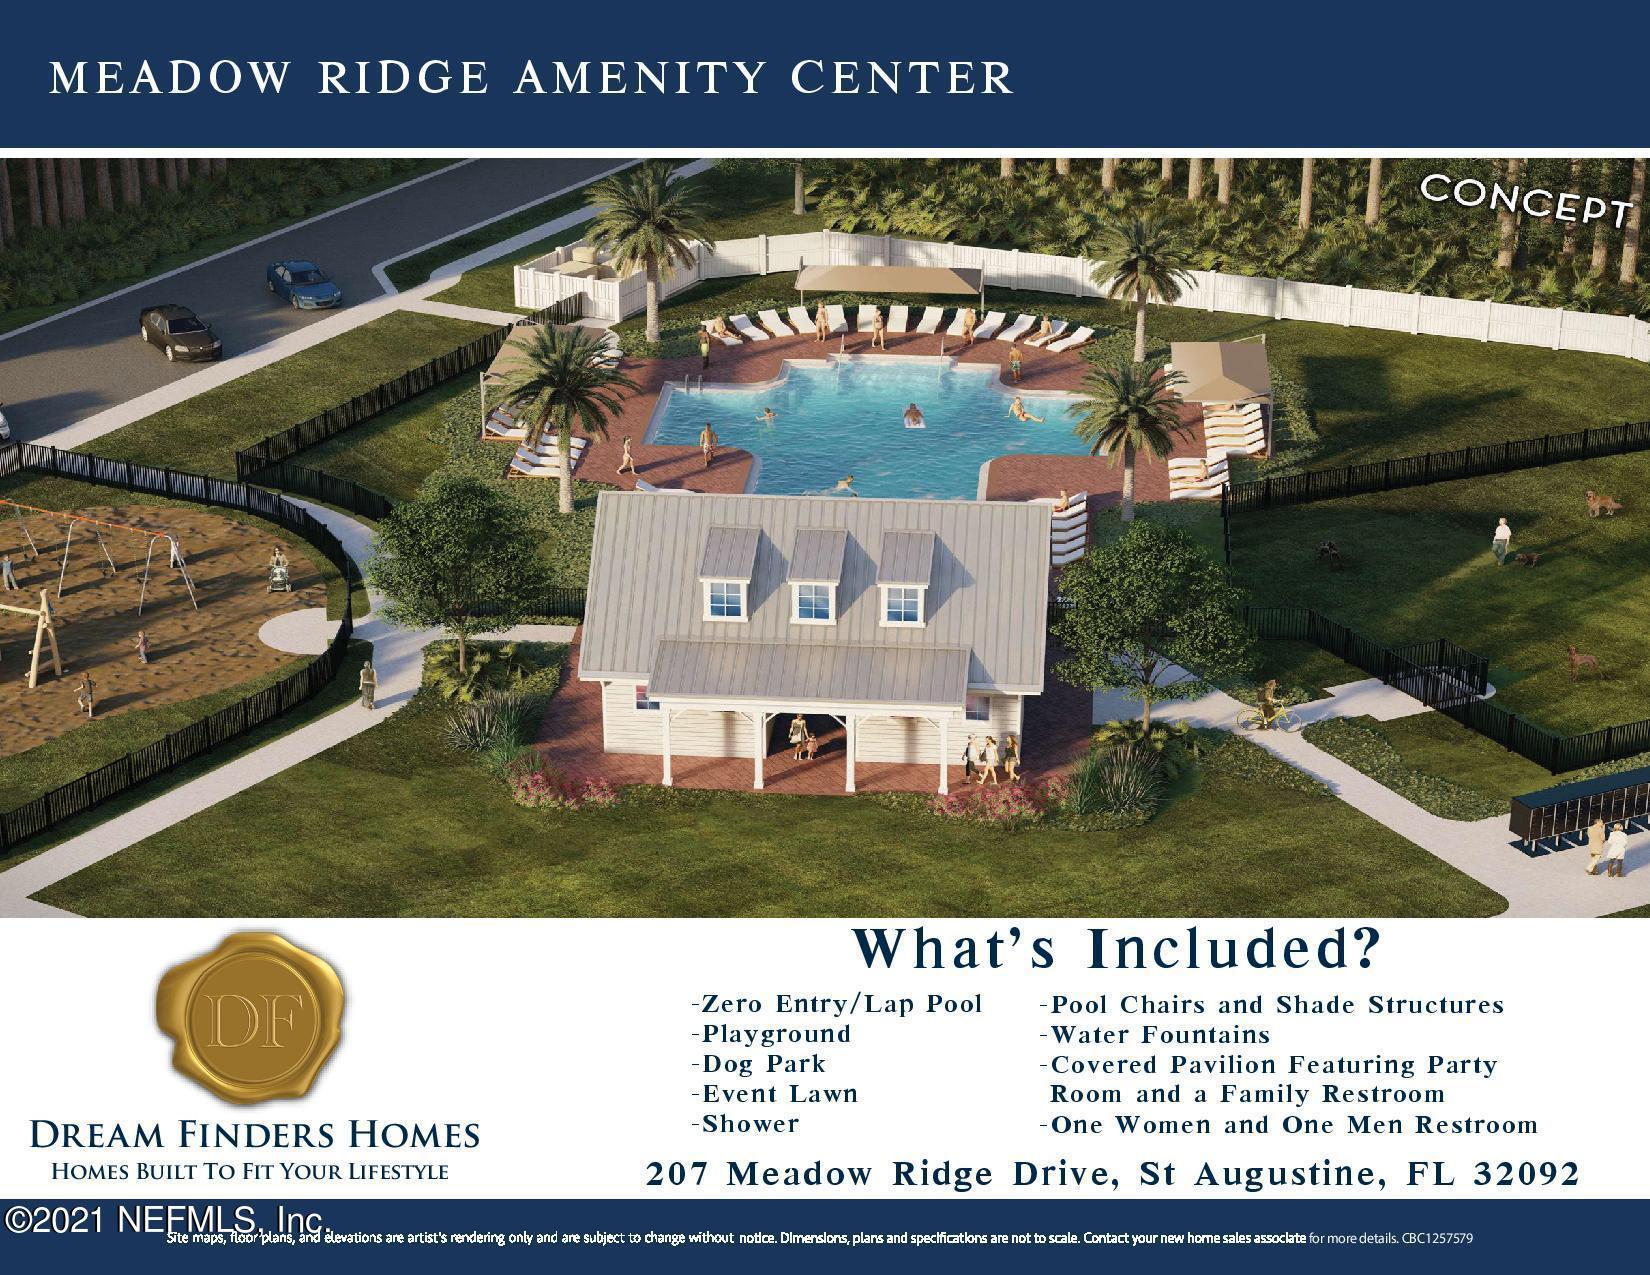 85 BIRCHFIELD, ST AUGUSTINE, FLORIDA 32092, 4 Bedrooms Bedrooms, ,2 BathroomsBathrooms,Residential,For sale,BIRCHFIELD,1065681